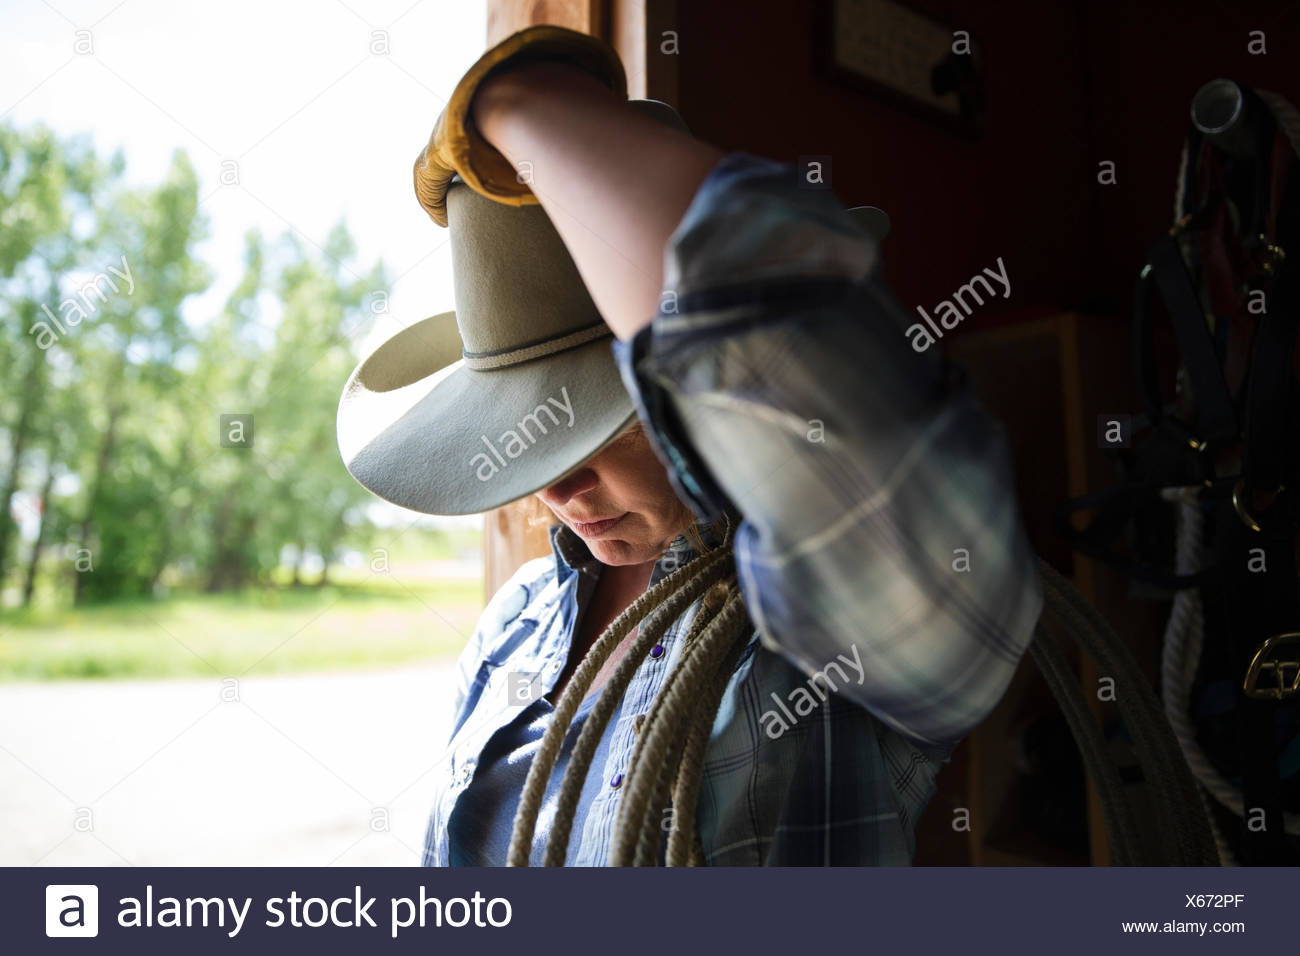 bab7de8762c09 Cowboy Looking Down Stock Photos   Cowboy Looking Down Stock Images ...